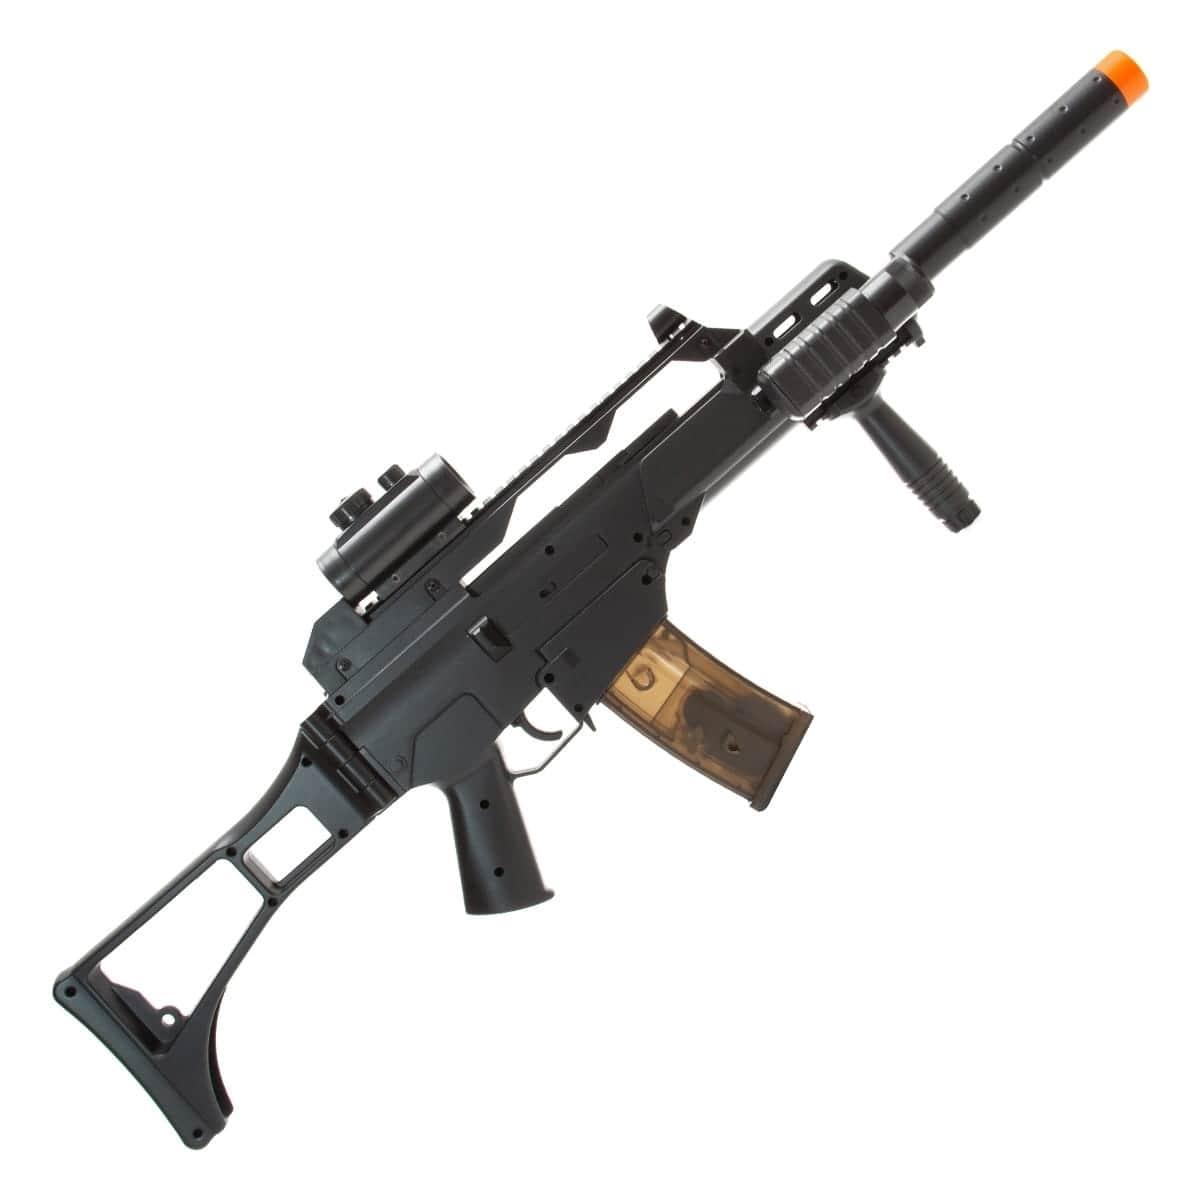 Rifle G36 Airsoft Elétrico Bivolt Cyma Cm021 6mm